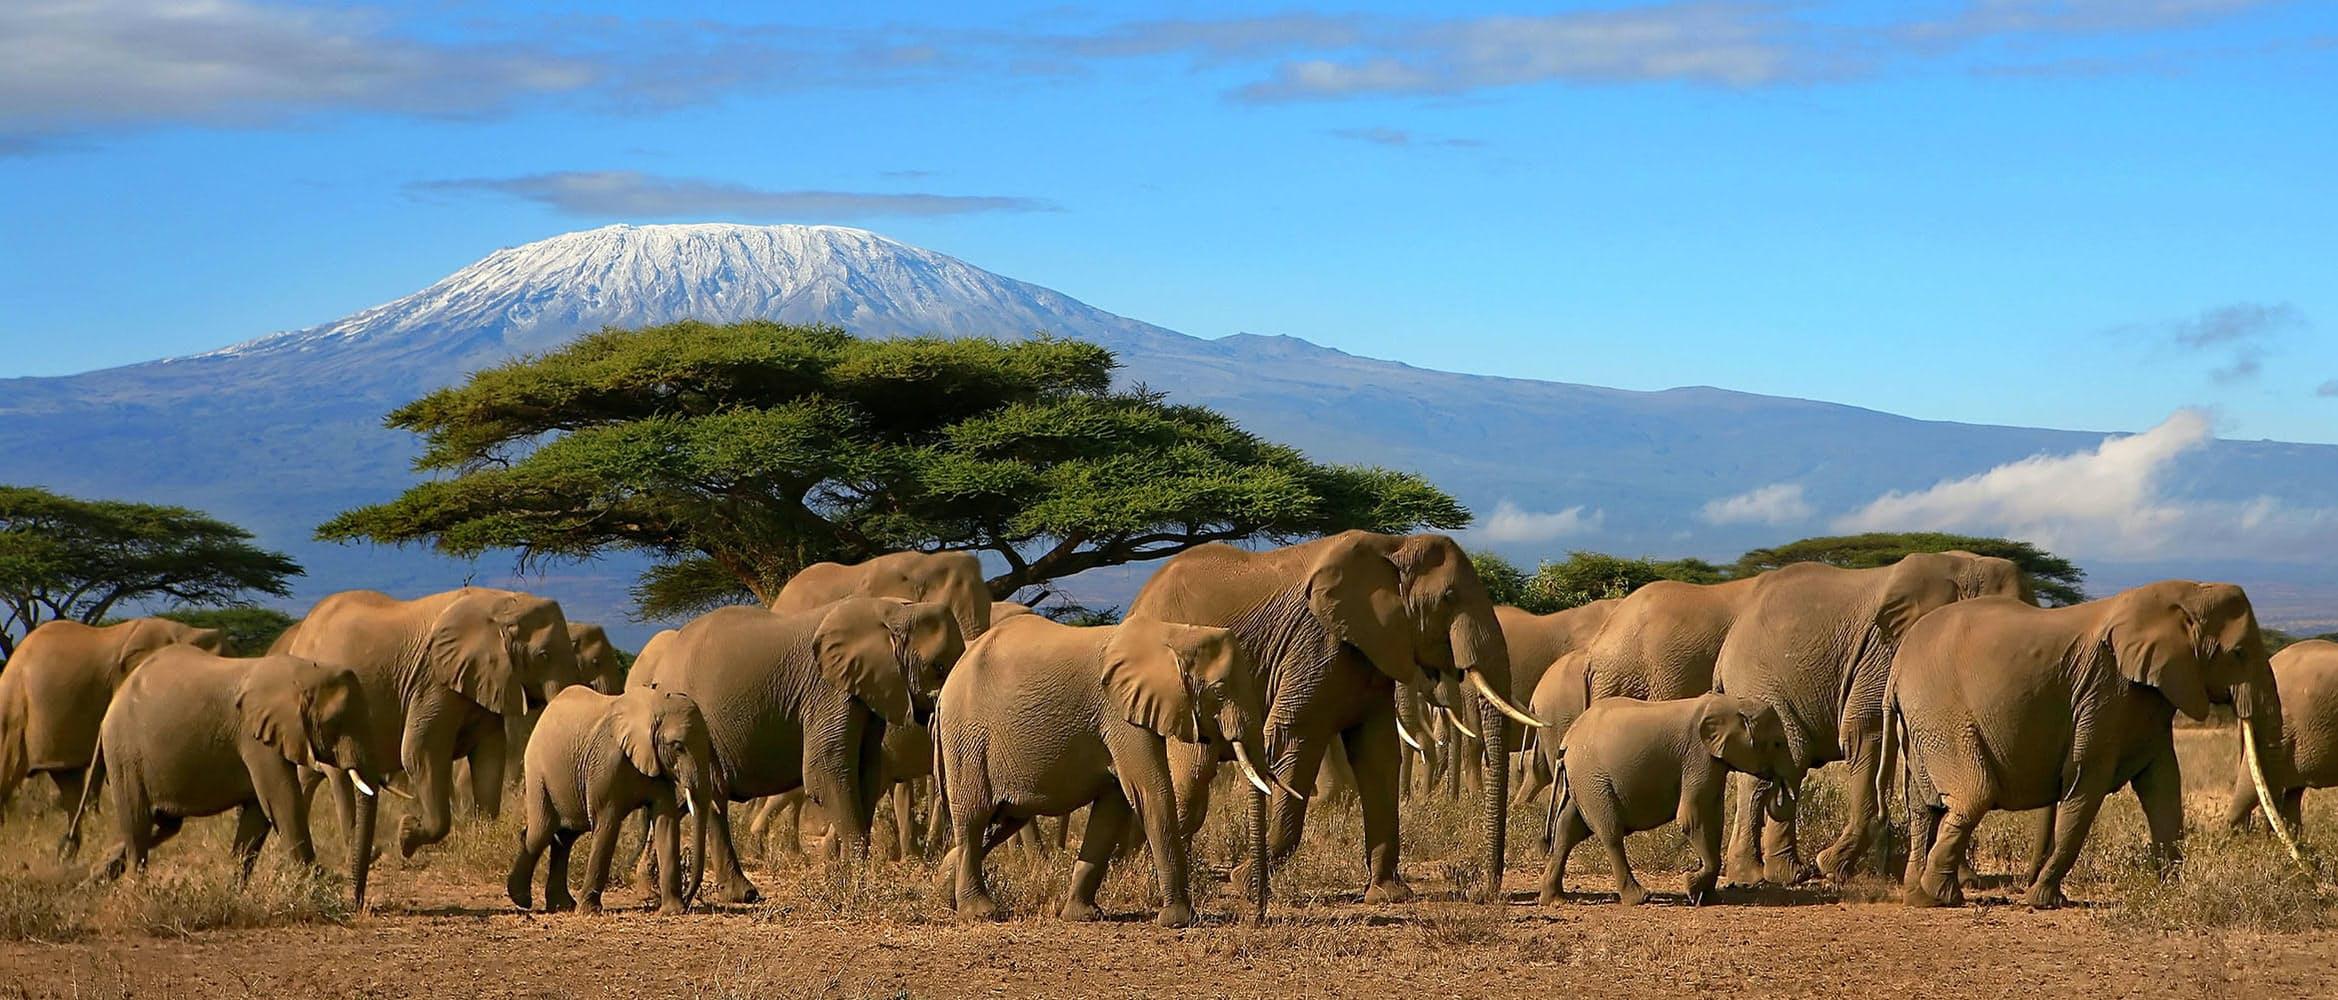 Featured 2x huckberry king of kilimanjaro michaela trimble header.jpg?ixlib=rails 2.1